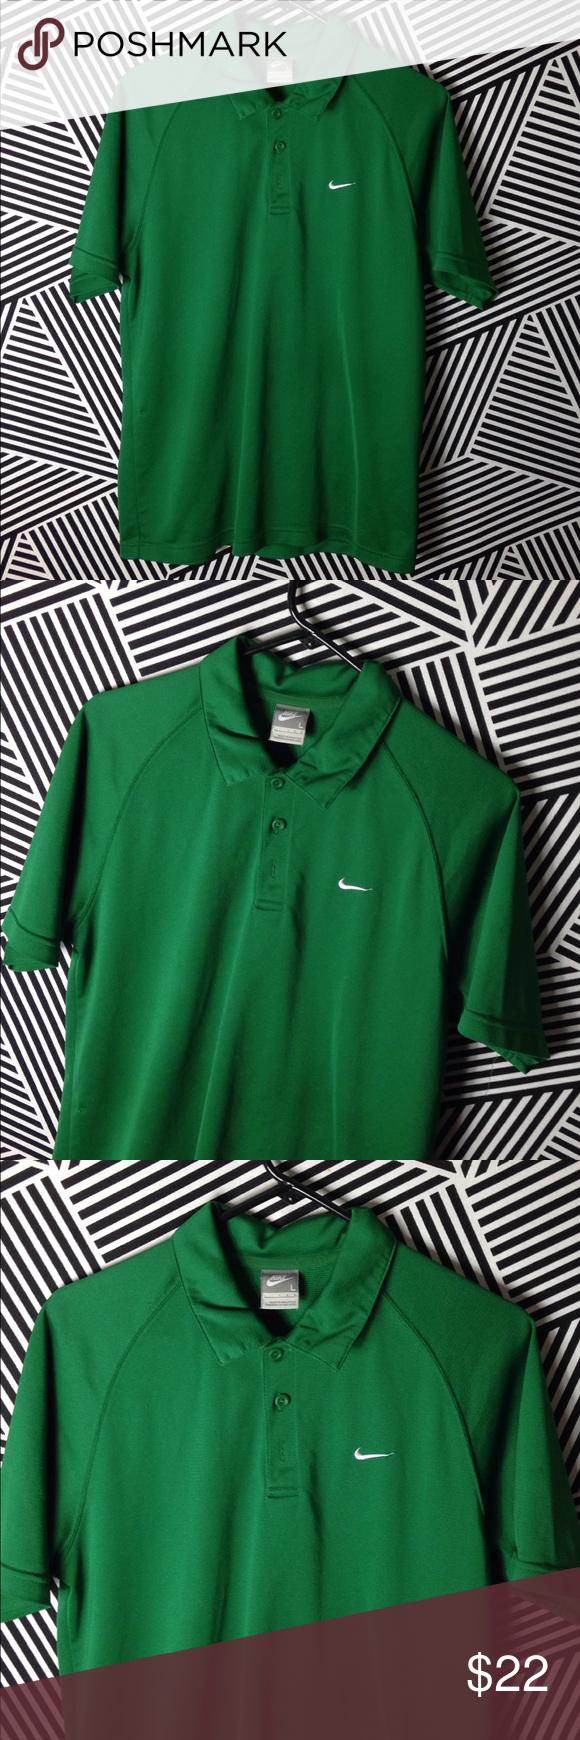 Vintage Nike Polo Golf Shirt Vintage Nike Golf Shirts Nike Polo